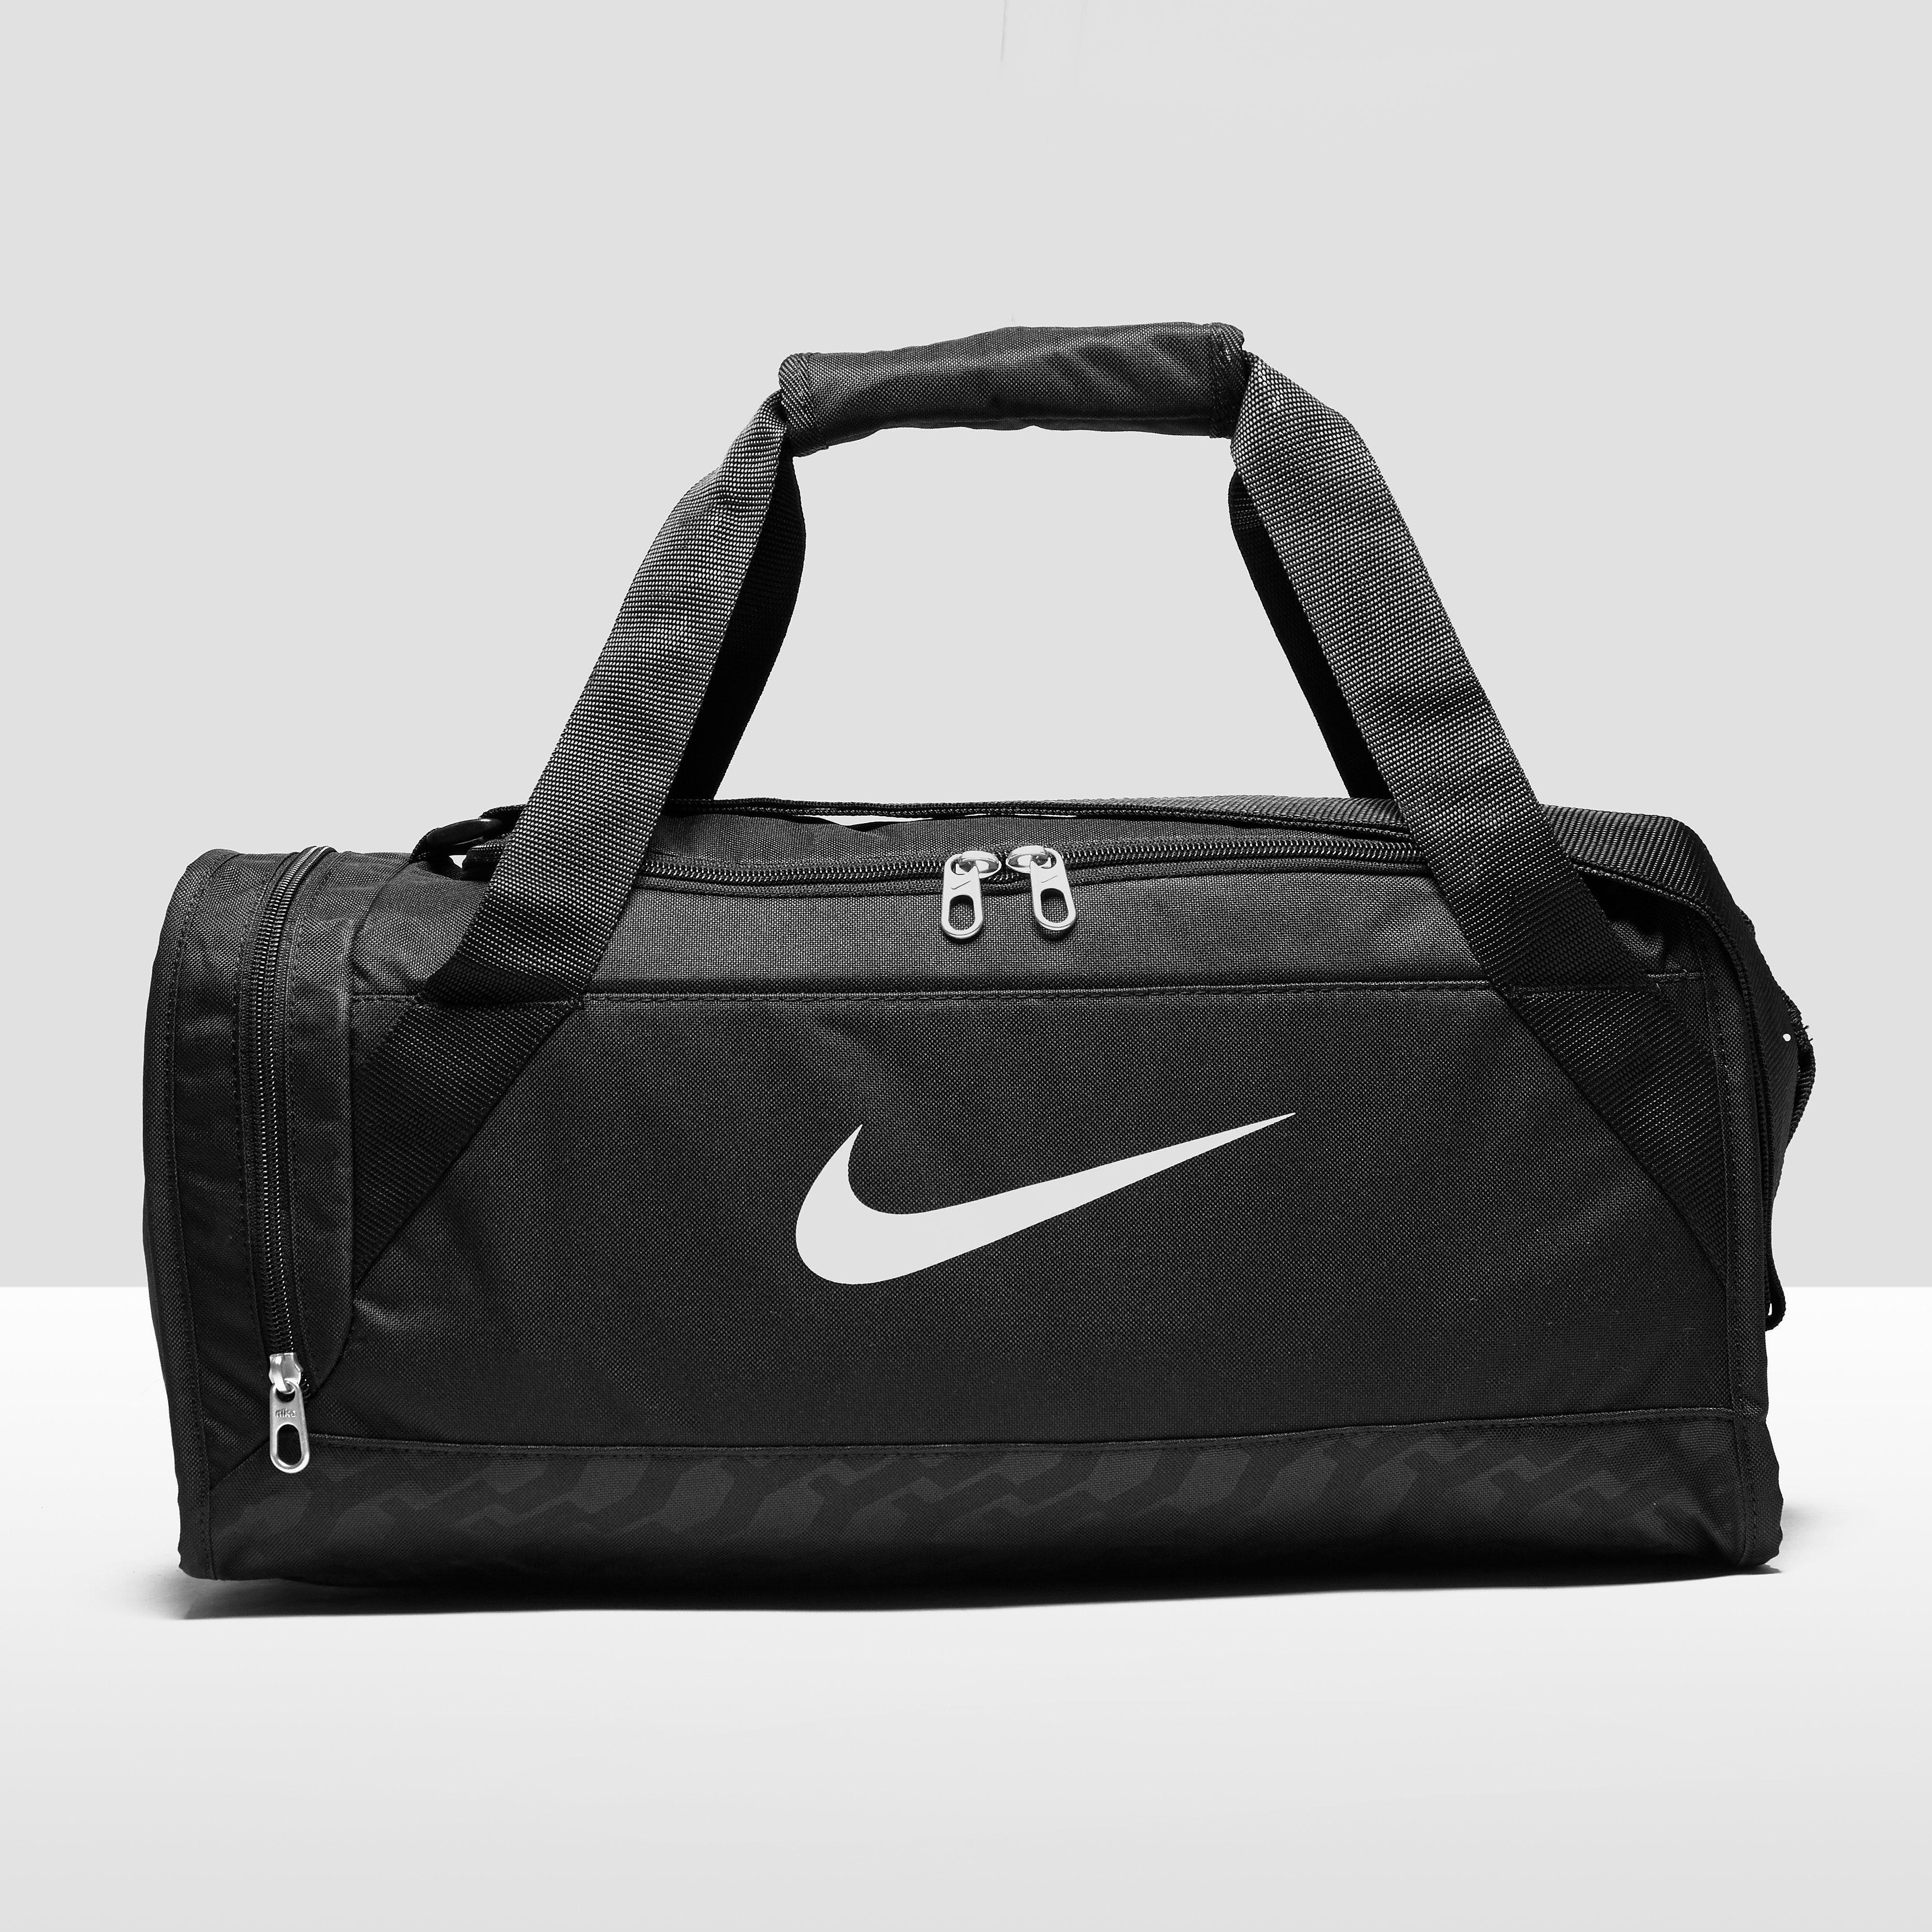 Nike BRASILIA 6 X-SMALL D